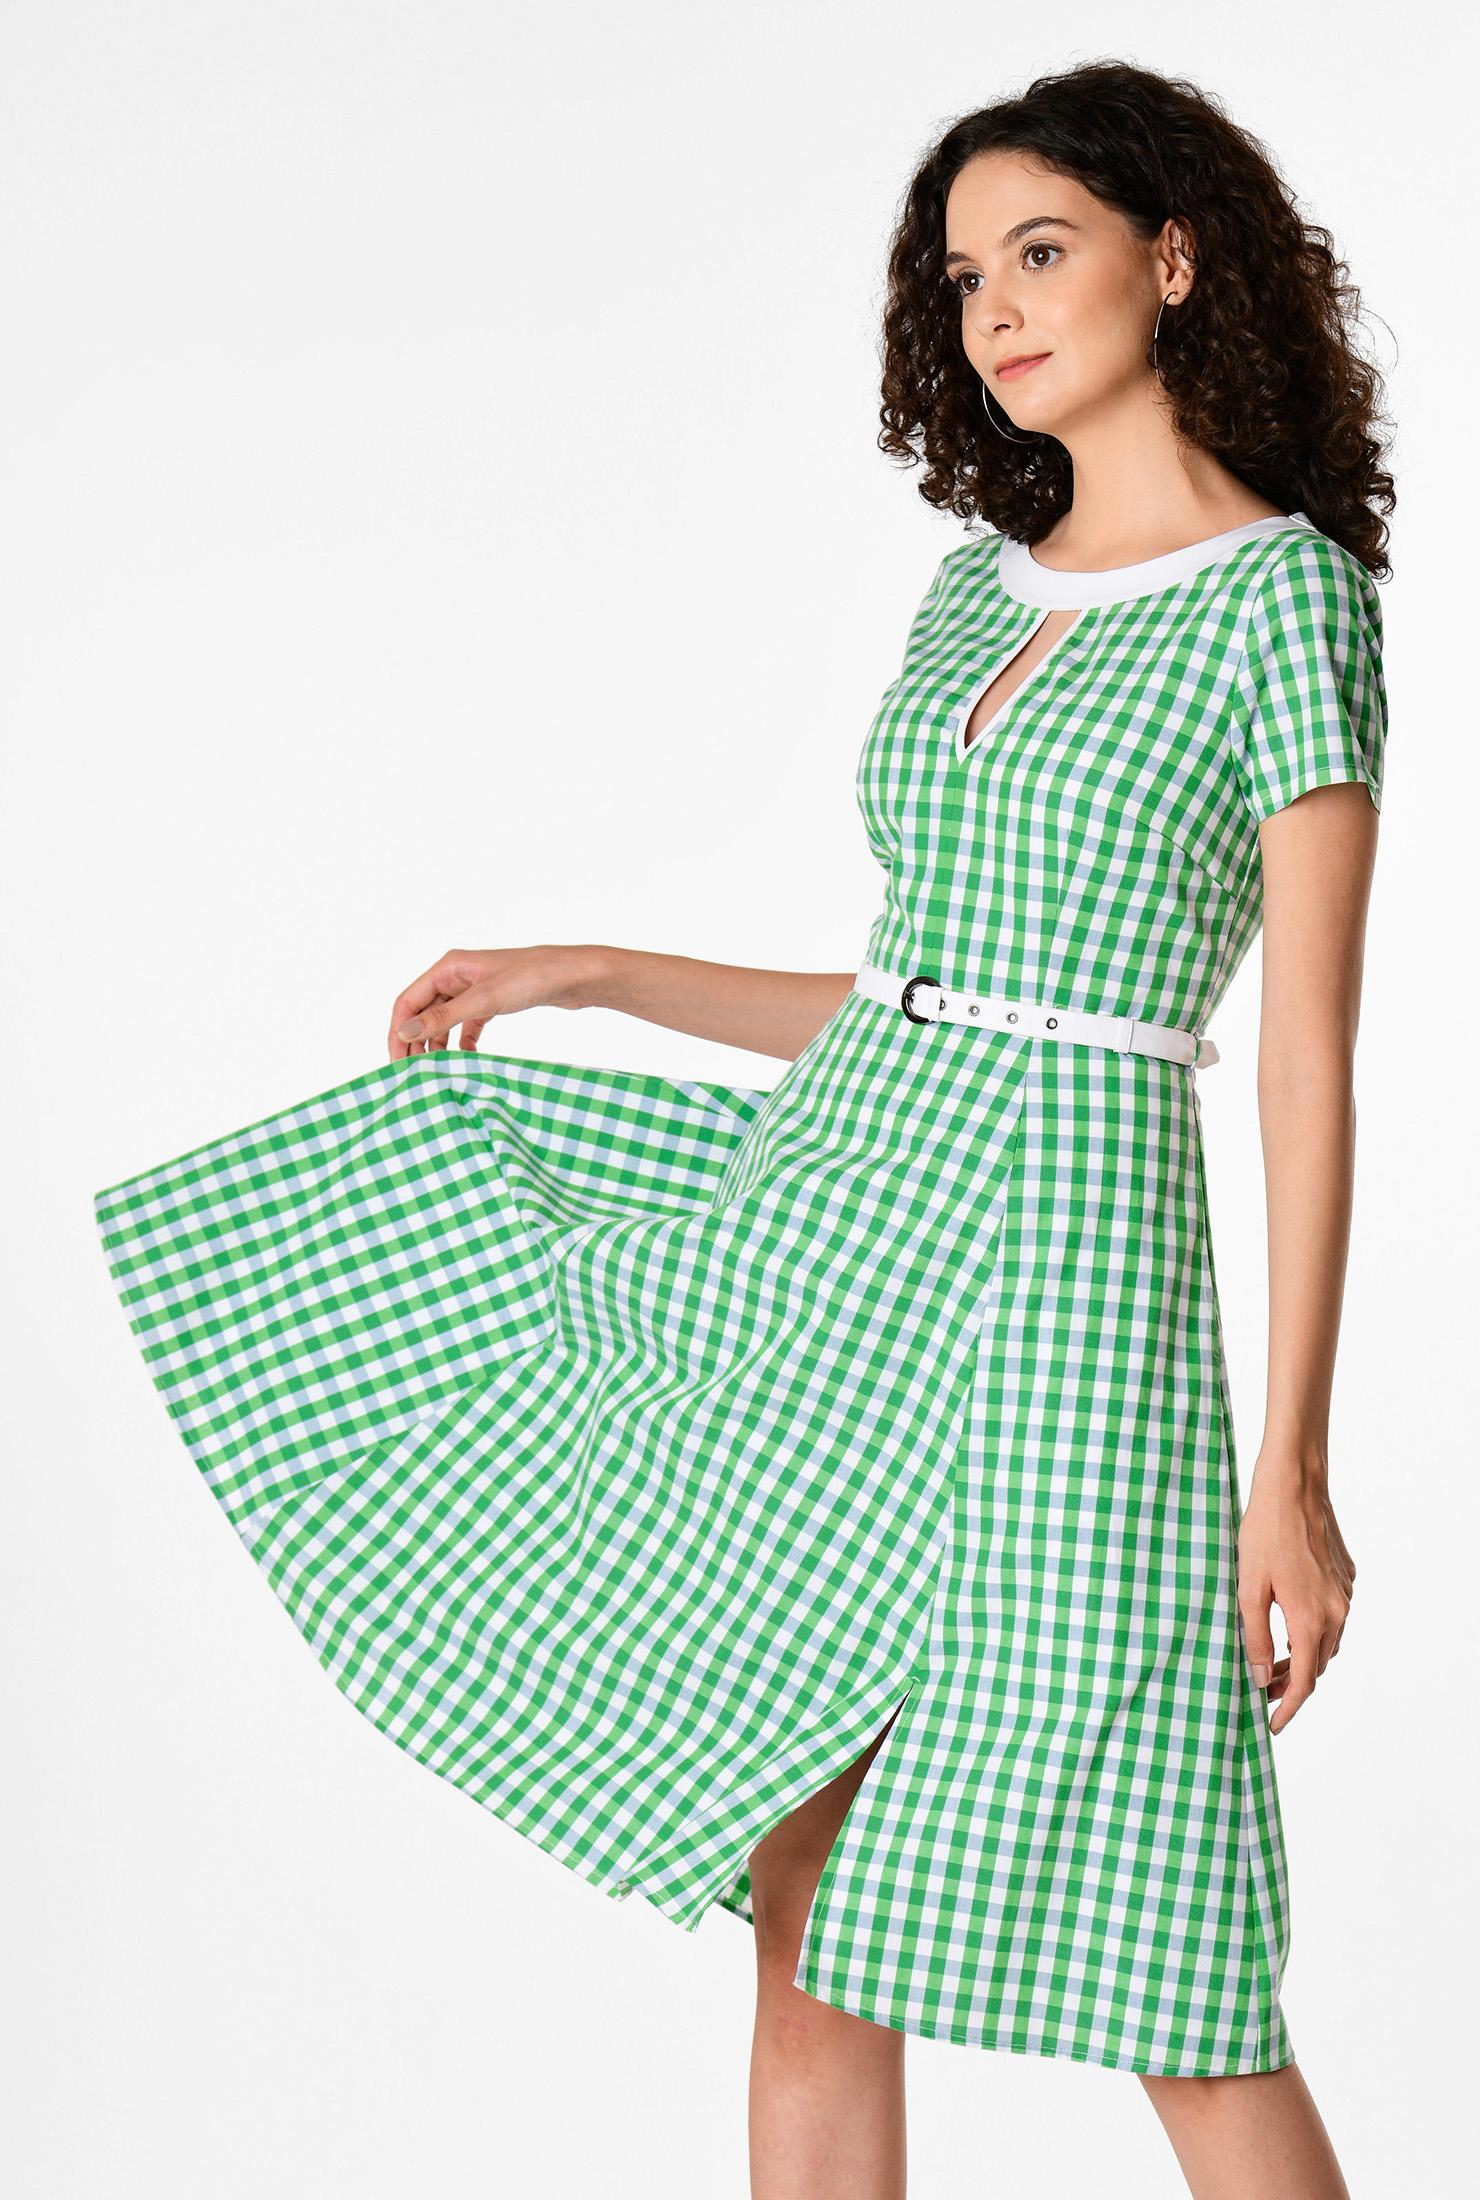 1960s Dresses | 60s Dresses Mod, Mini, Jackie O, Hippie Keyhole front gingham check cotton dress $59.95 AT vintagedancer.com